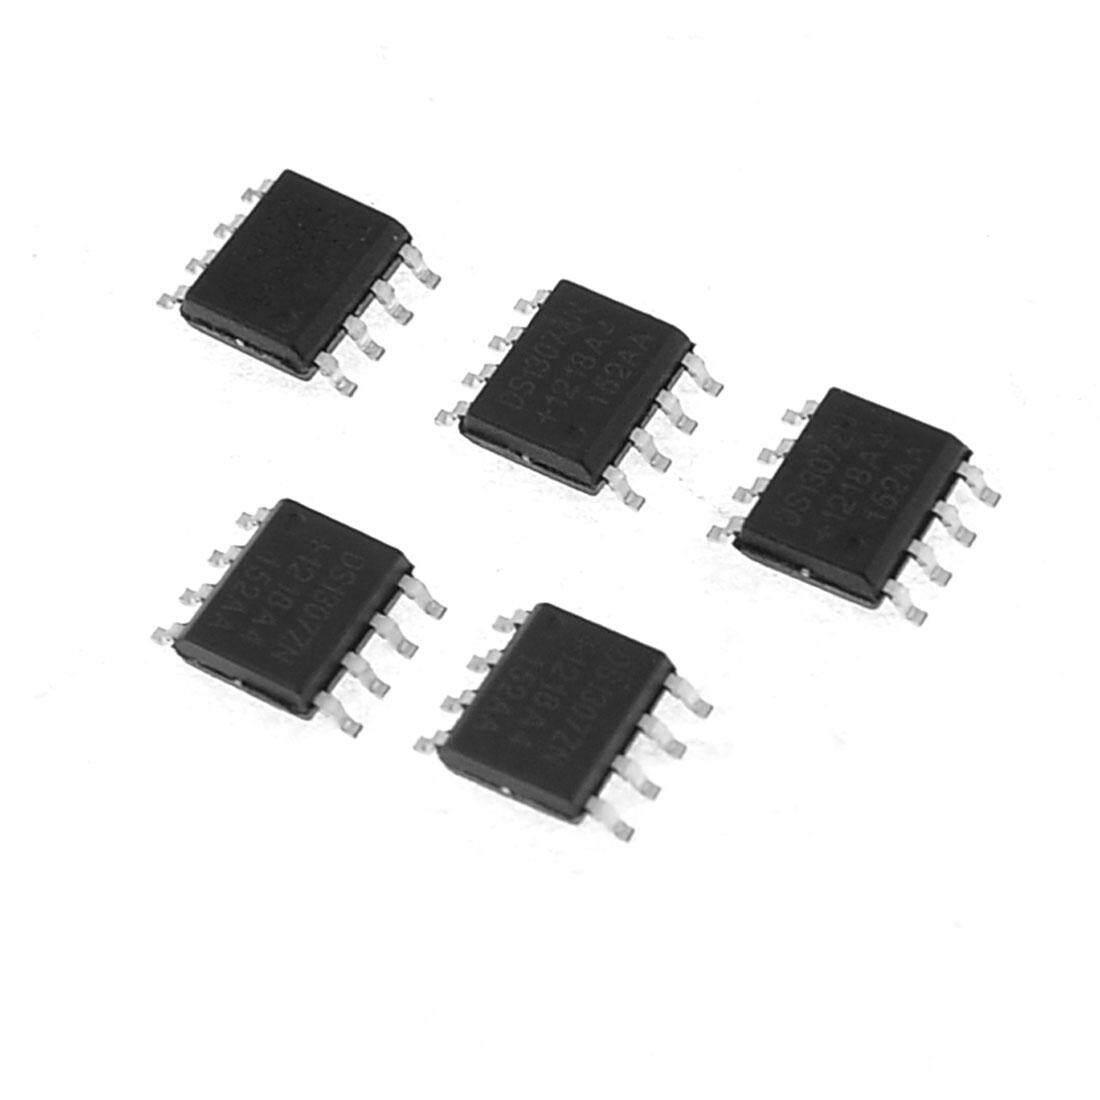 AXA 5 Pcs DS1307ZN Elektronik 8 Pin SMT SOIC Jam Curcuit IC